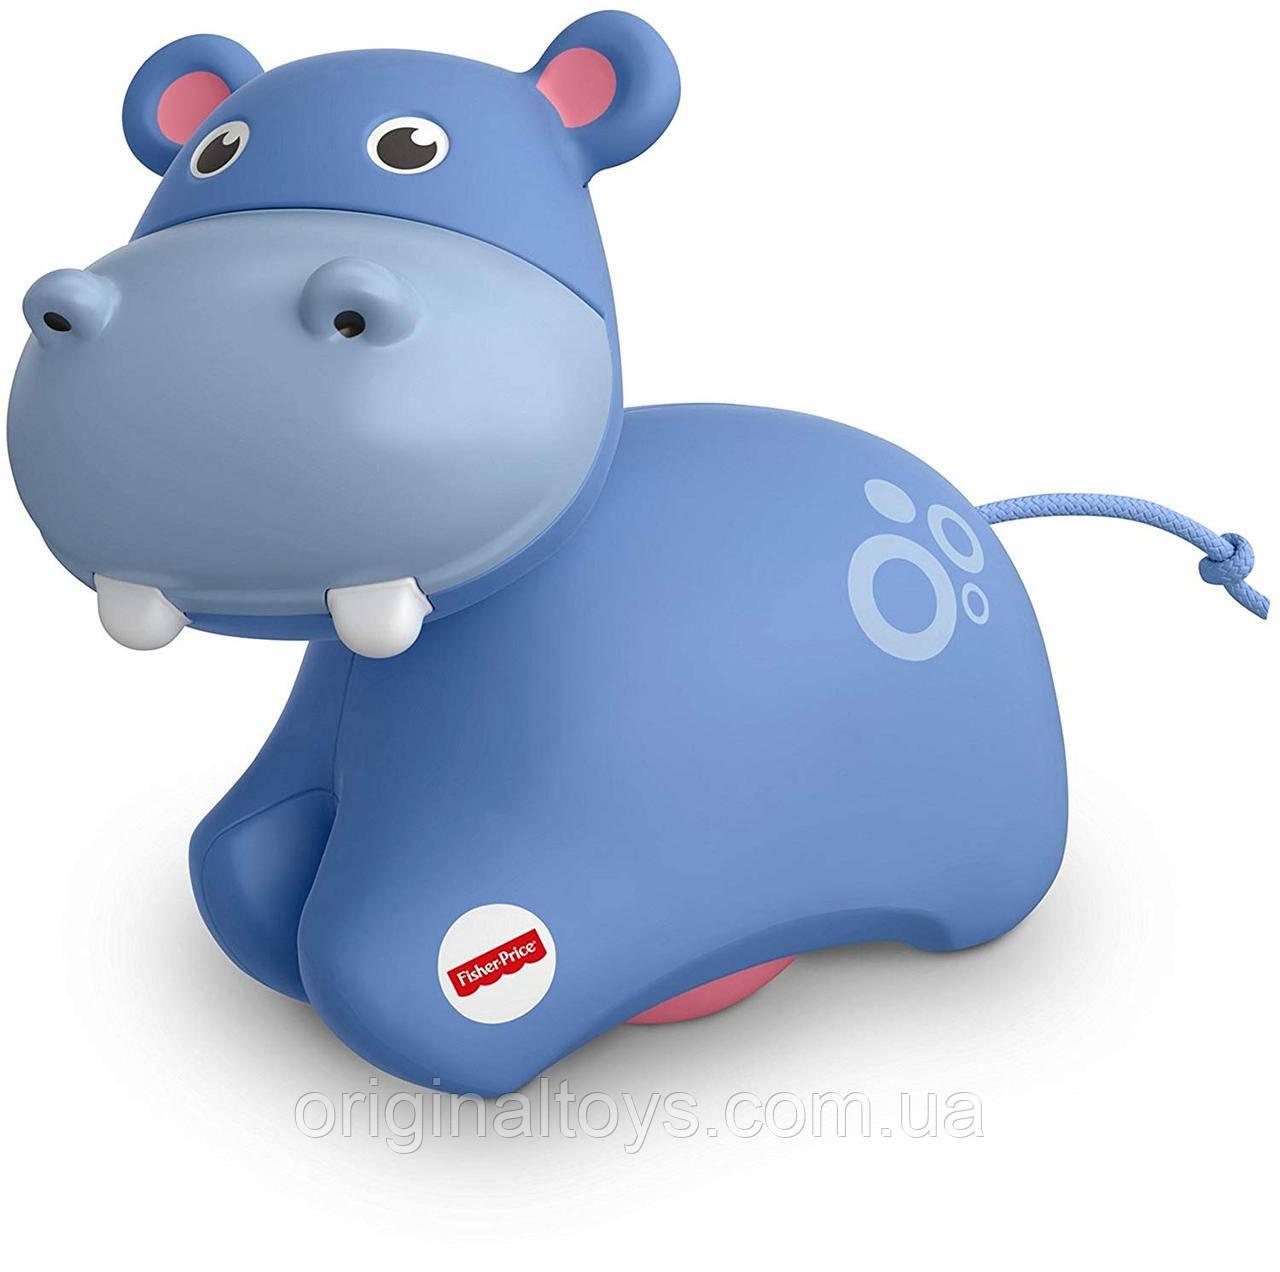 Fisher-Price Развивающая игрушка роллер Бегемот Roller Hippo FRR62